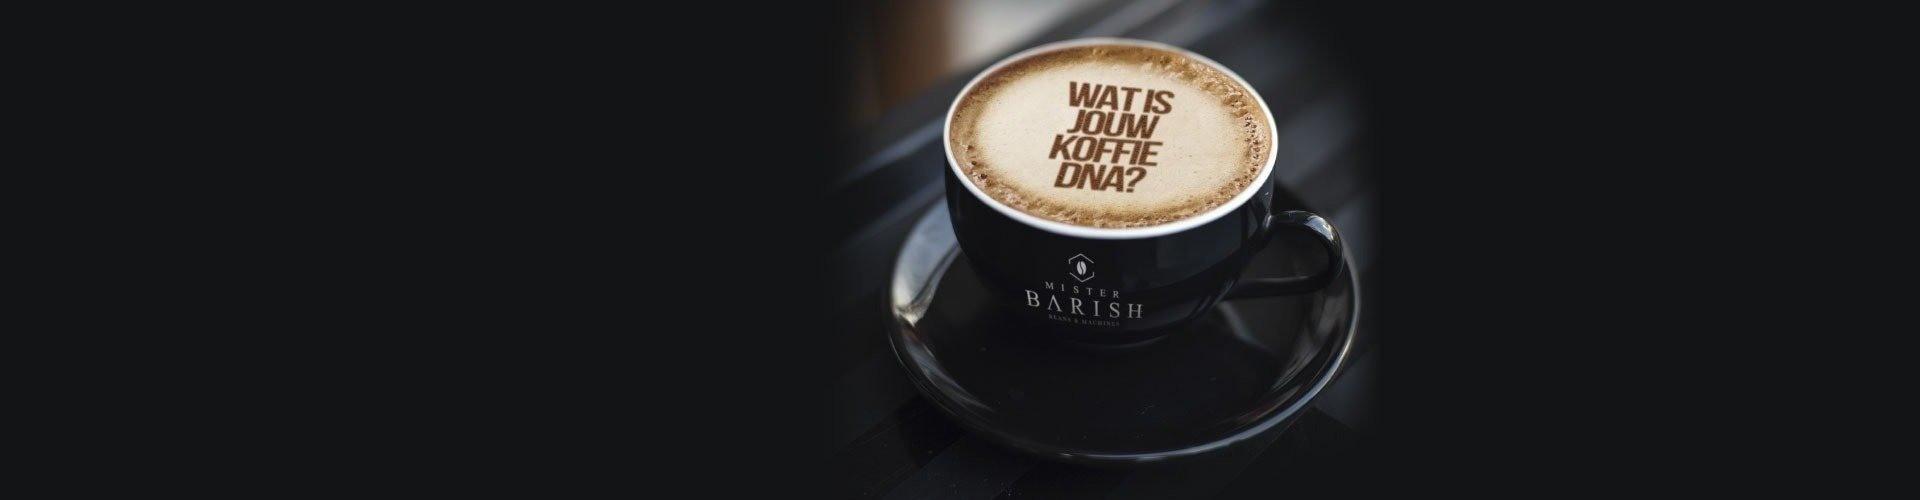 Koffie op het werk op basis van koffie DNA